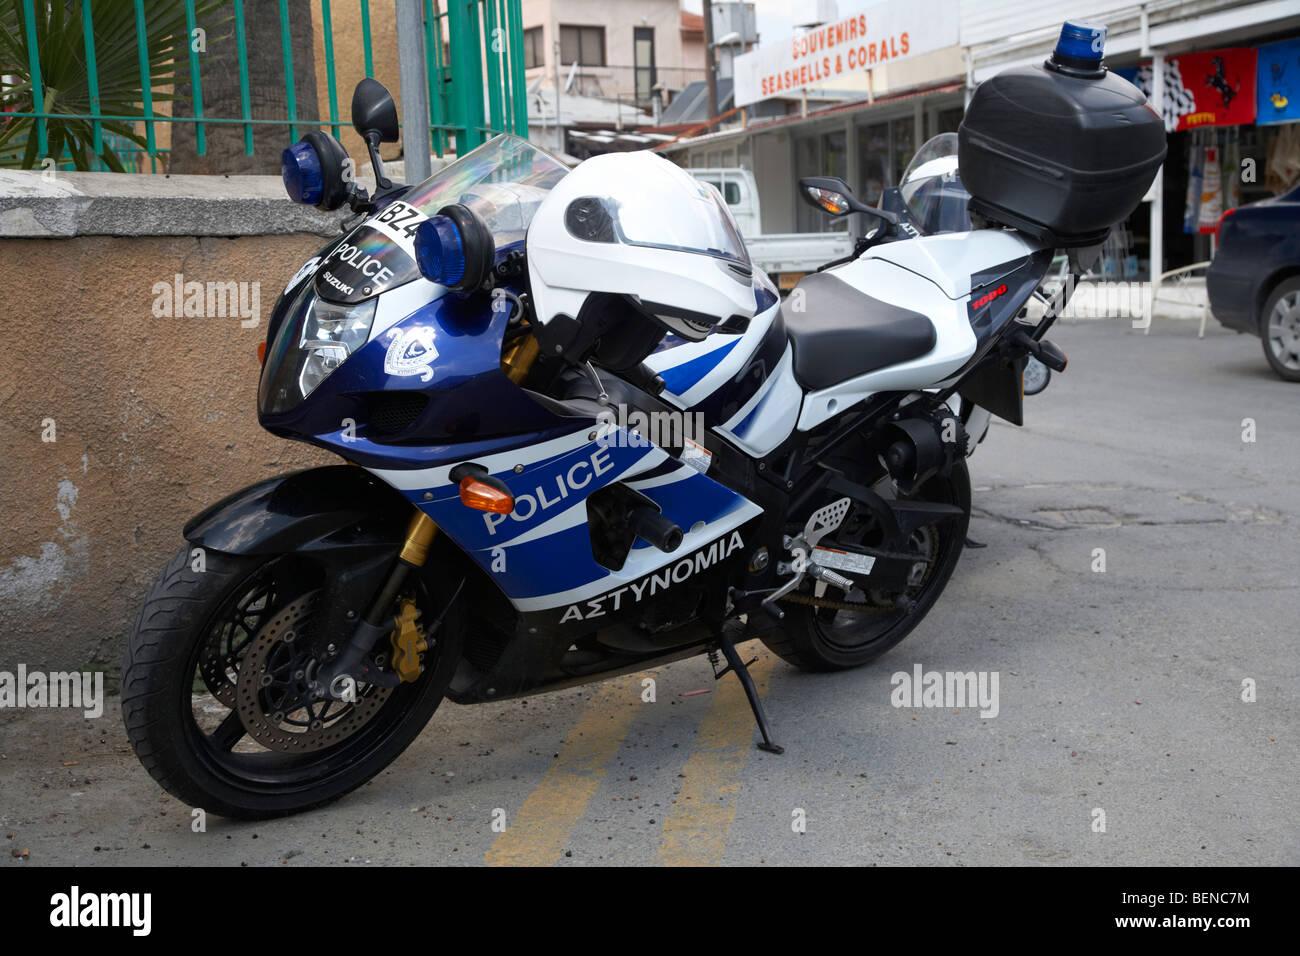 Police Motor Fotos e Imágenes de stock Alamy